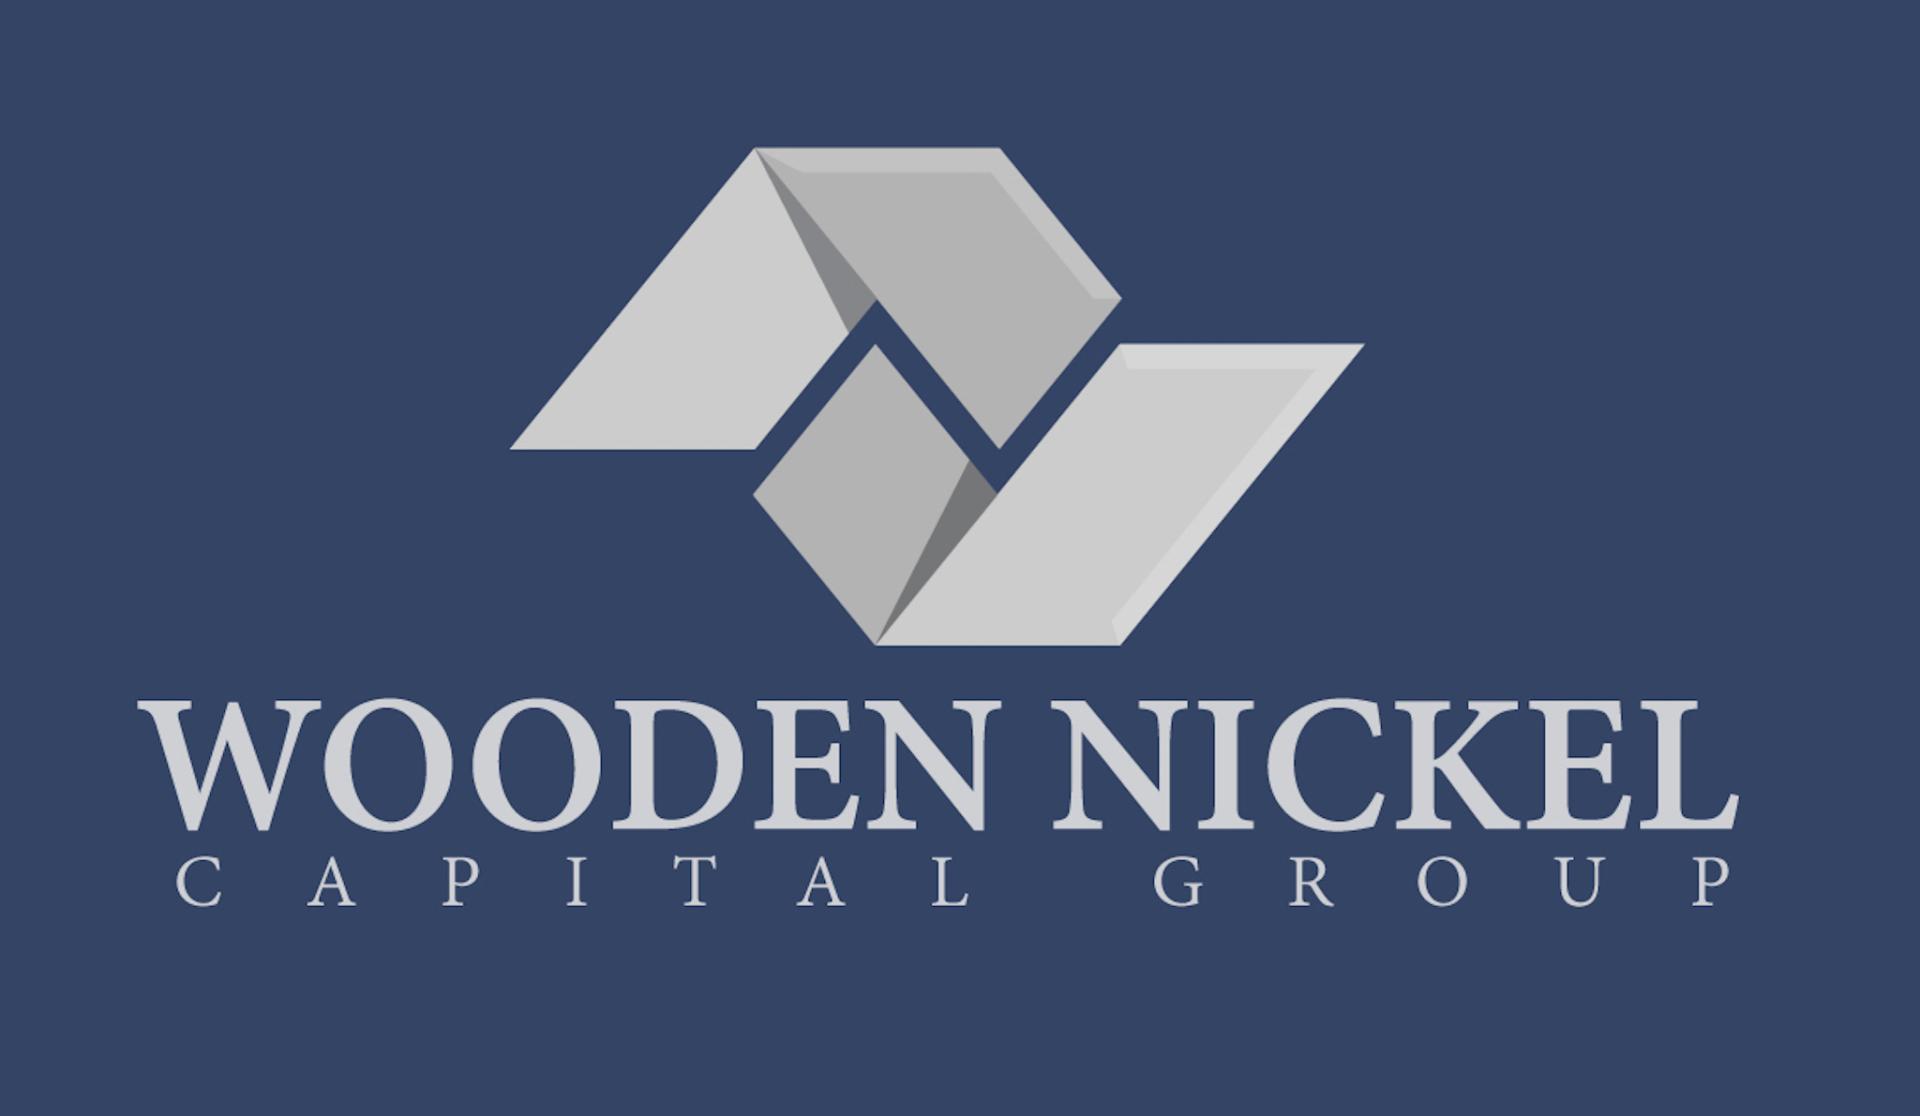 Wooden Nickel Capital Group